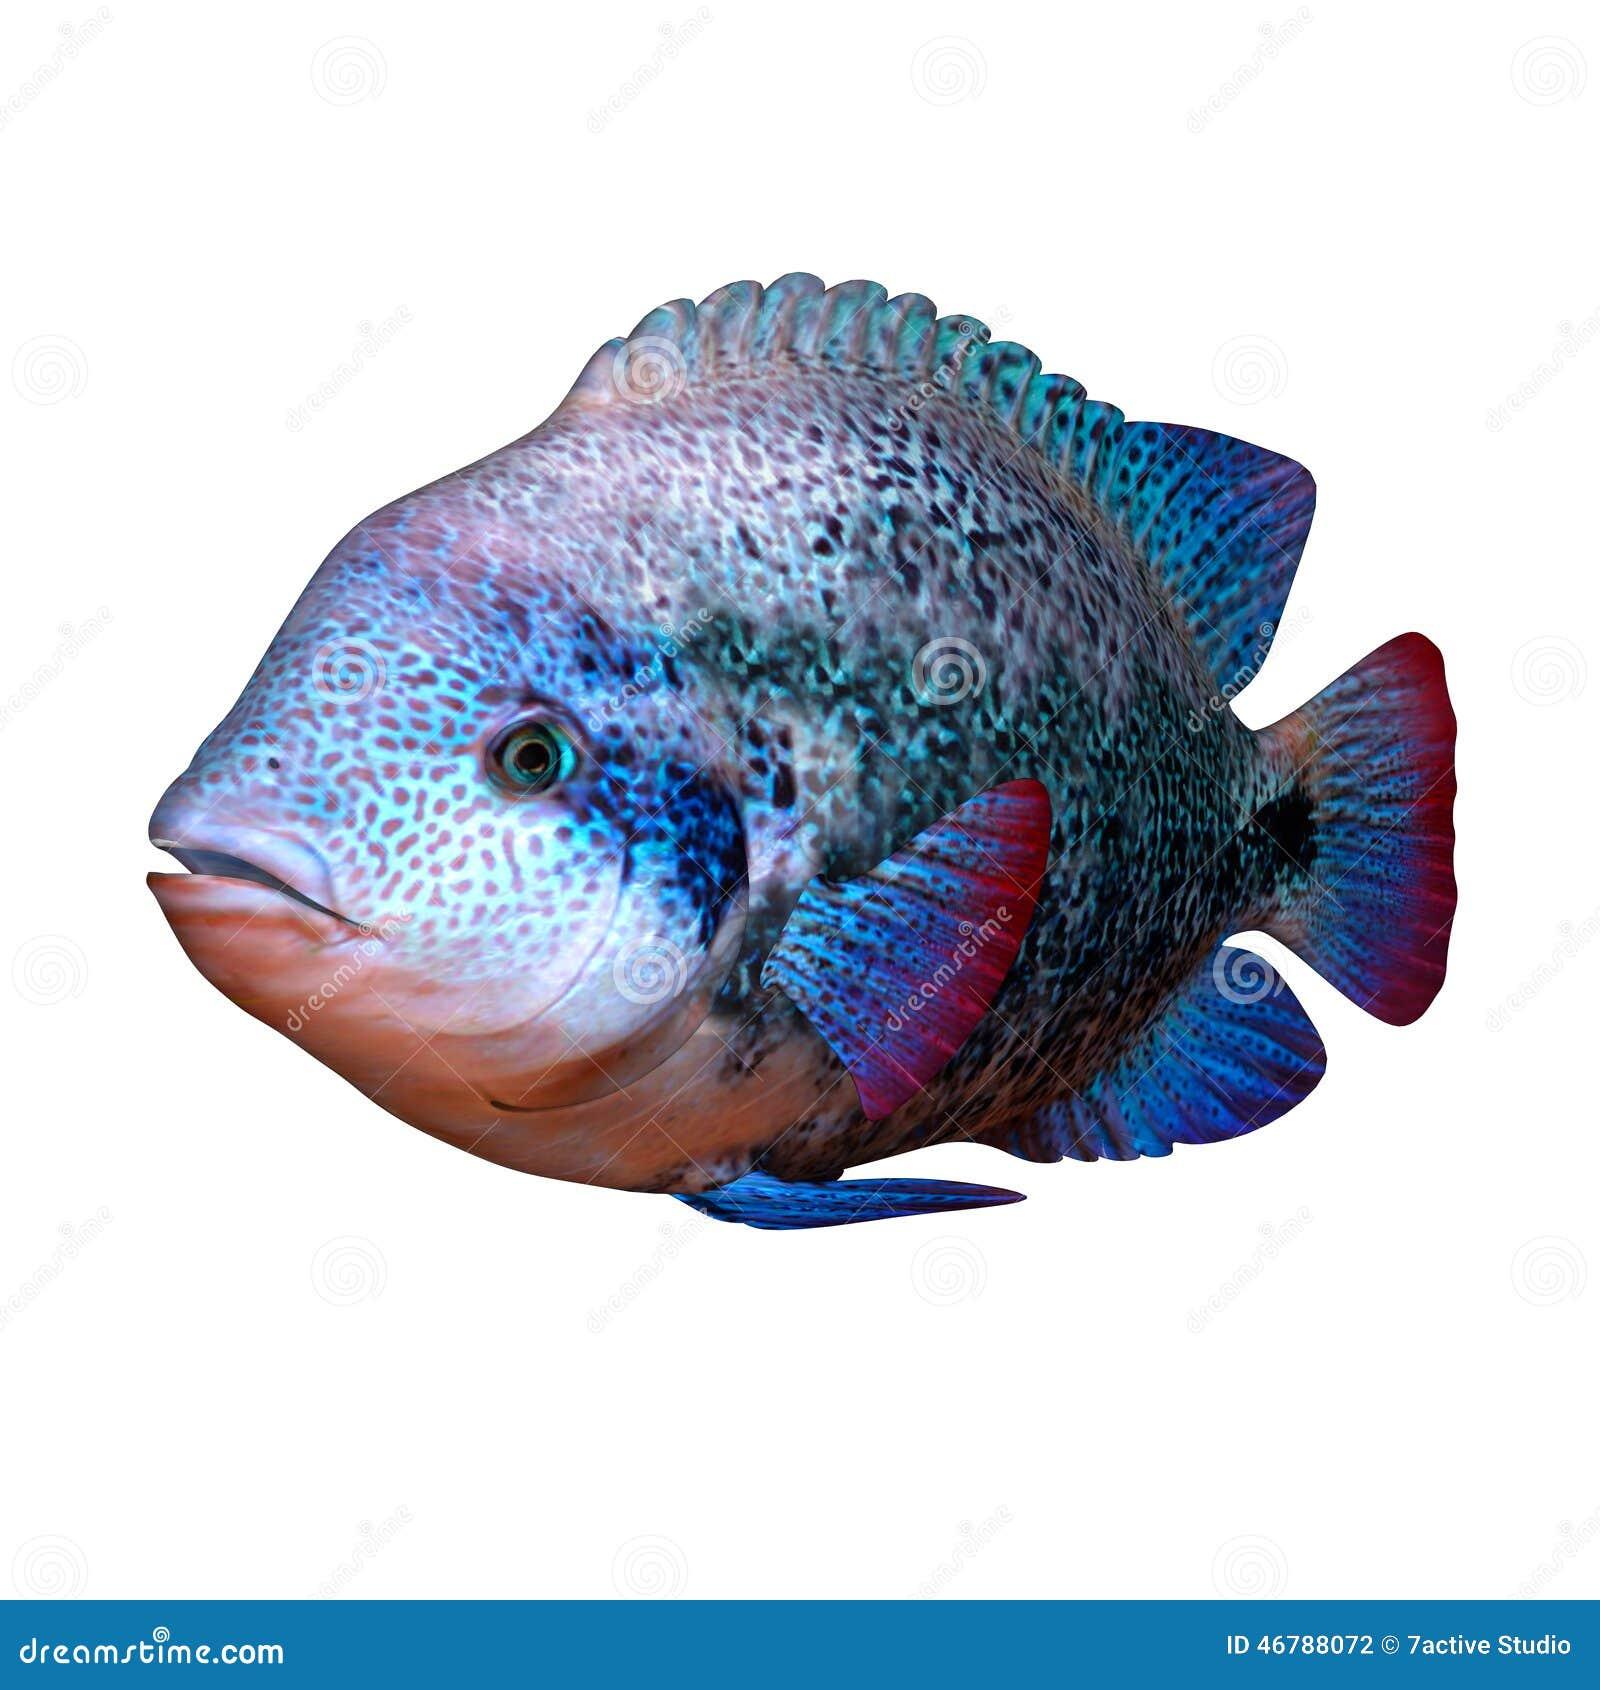 Cichlid fish stock illustration. Illustration of living - 46788072